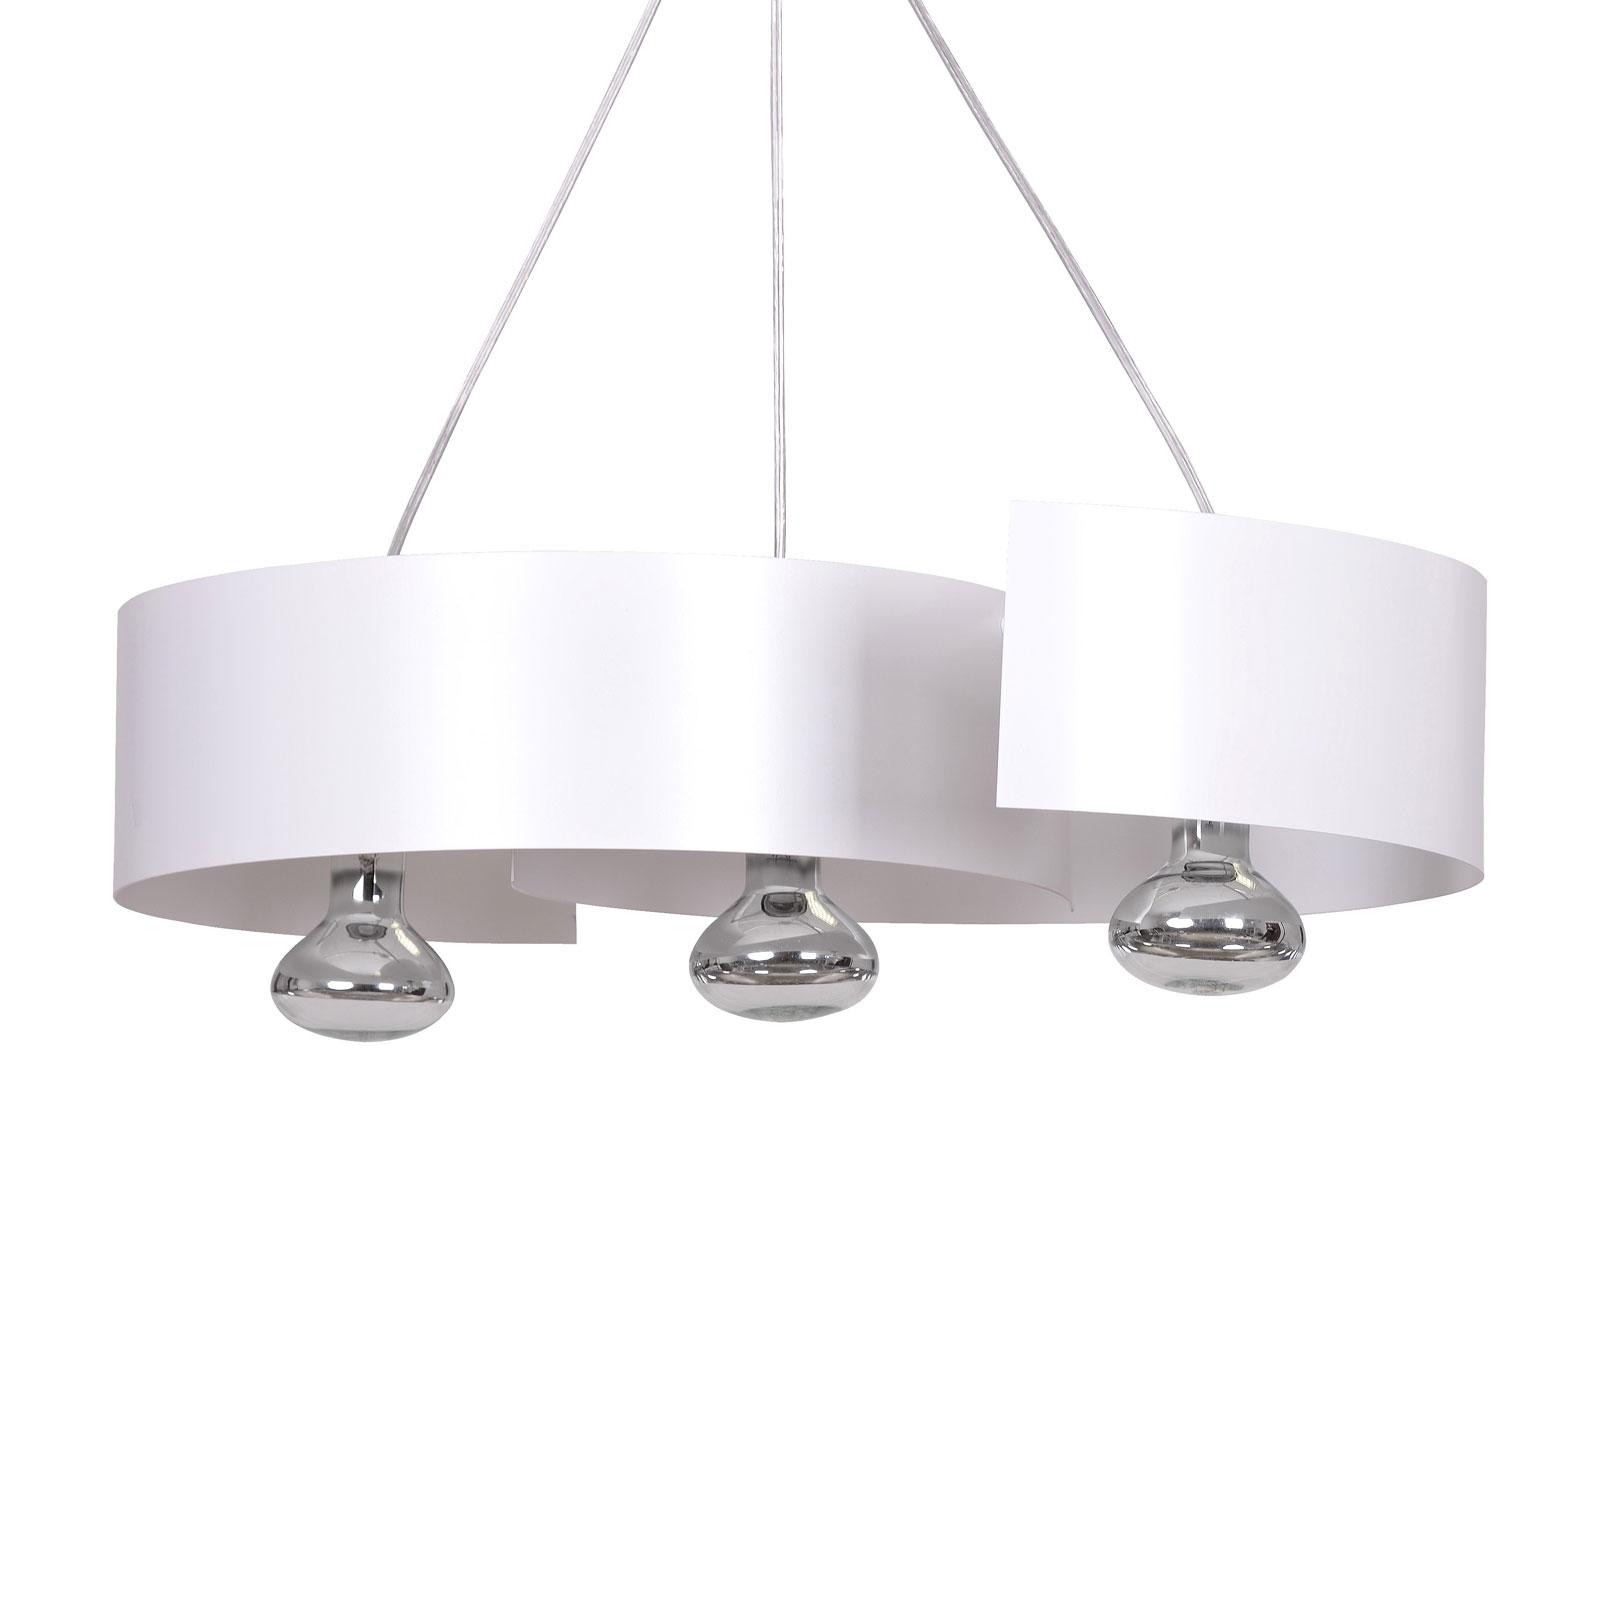 Lámpara colgante Vixon 3, 3 luces, blanca